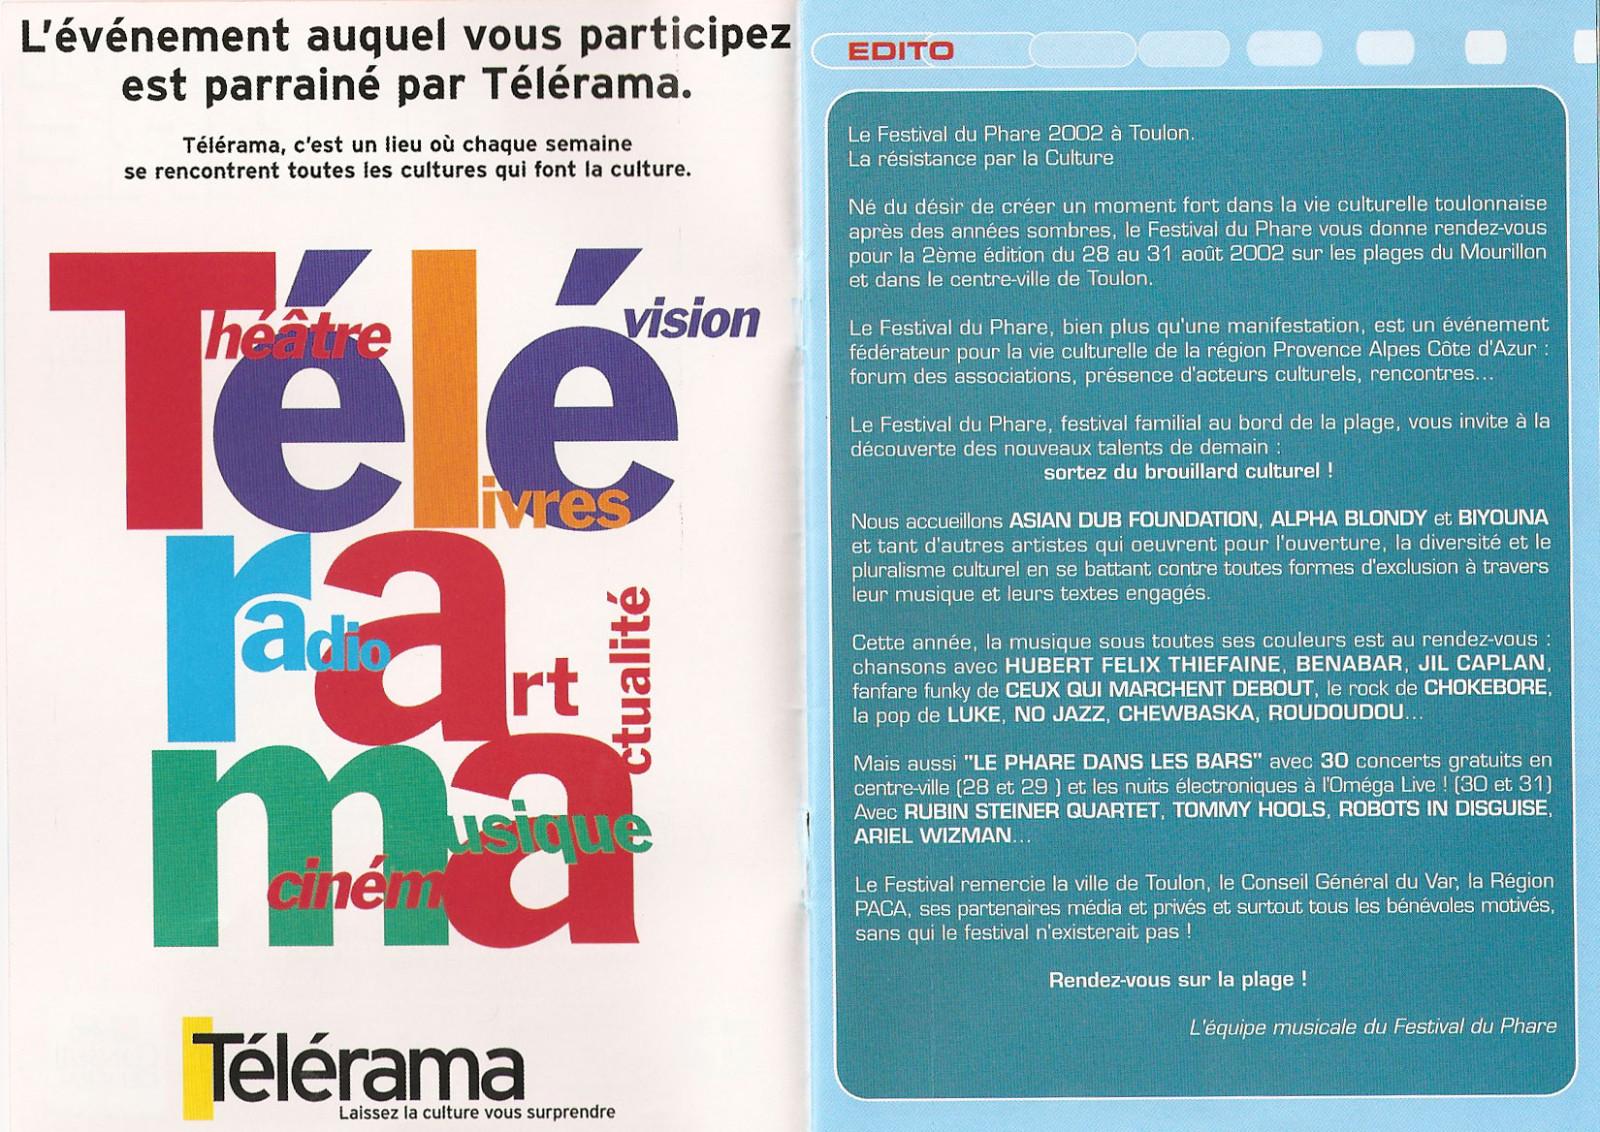 Festival du Phare 2002 | Toulon | Partenariat Télérama |  Festival du Phare  | Toulon | 2002 | Revue de presse Festival du Phare  | Toulon | 2002 | Revue de presse edito festival du phare 2002 telerama jv banes culture digitale